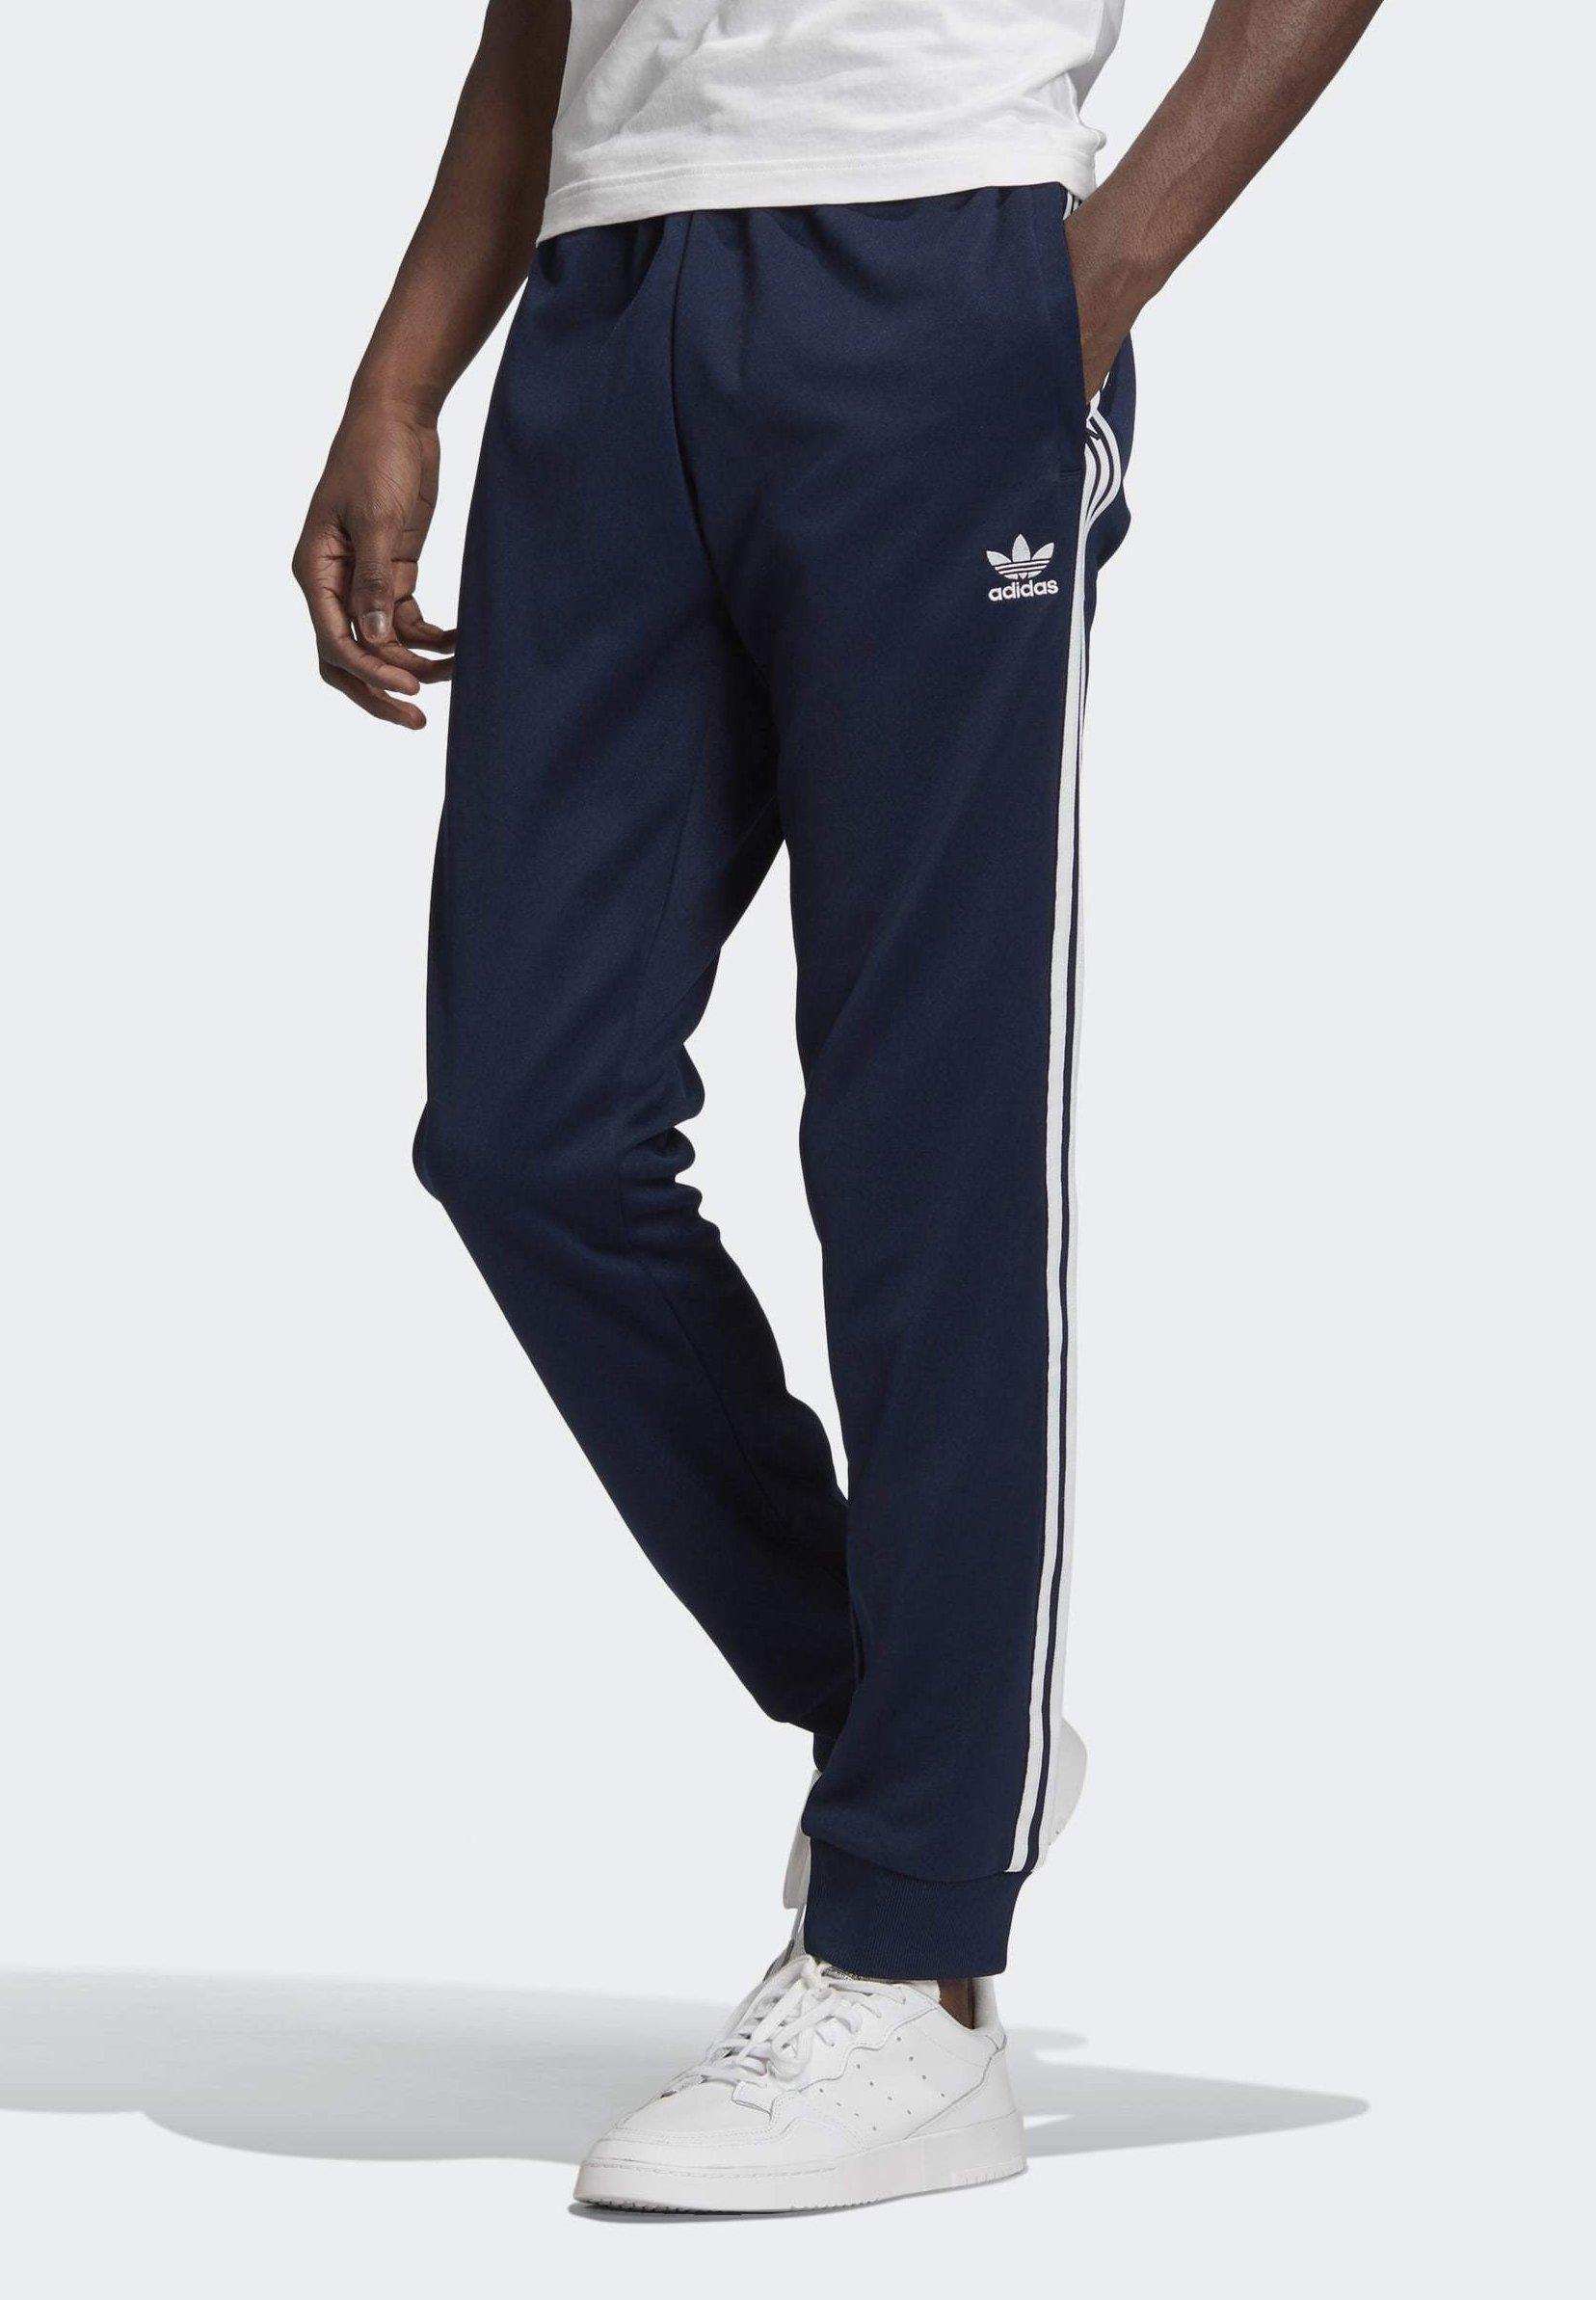 robot En cualquier momento lona  adidas Originals ADICOLOR CLASSICS PRIMEBLUE SST TRACKSUIT BOTTOM - Pantalon  de survêtement - blue - ZALANDO.FR